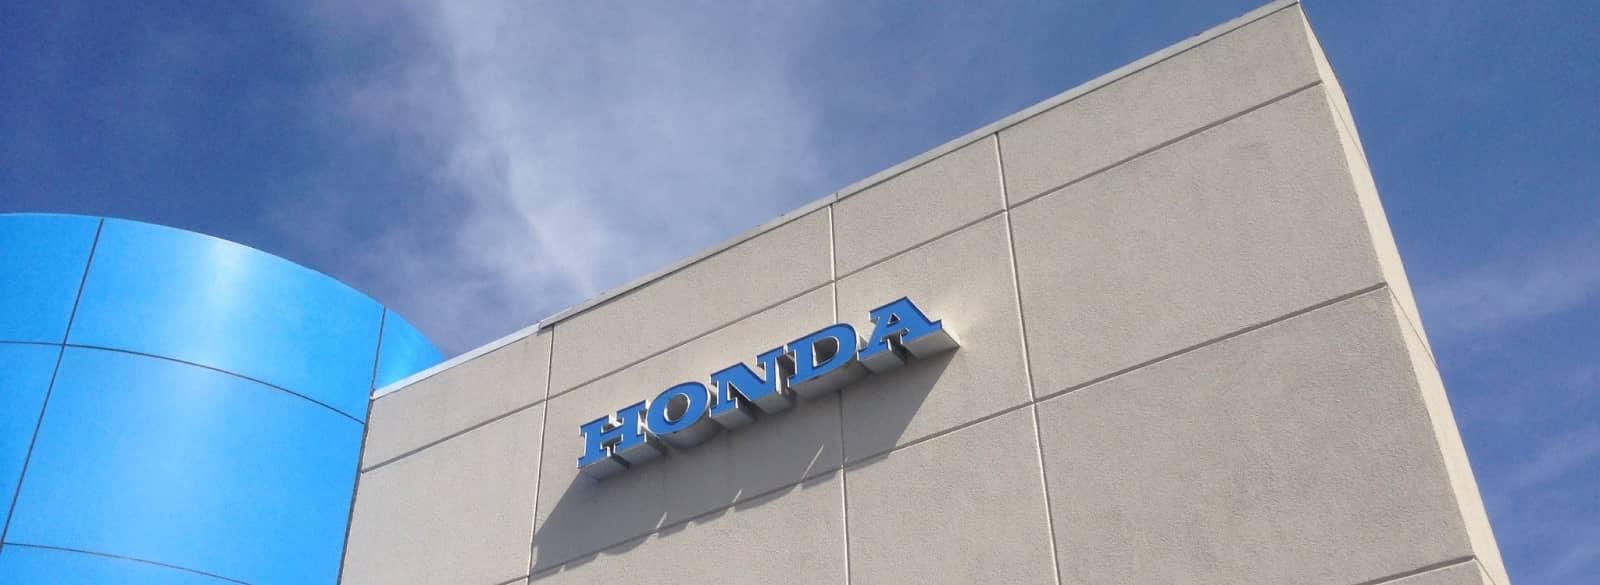 Mt. Kisco Honda dealership building.